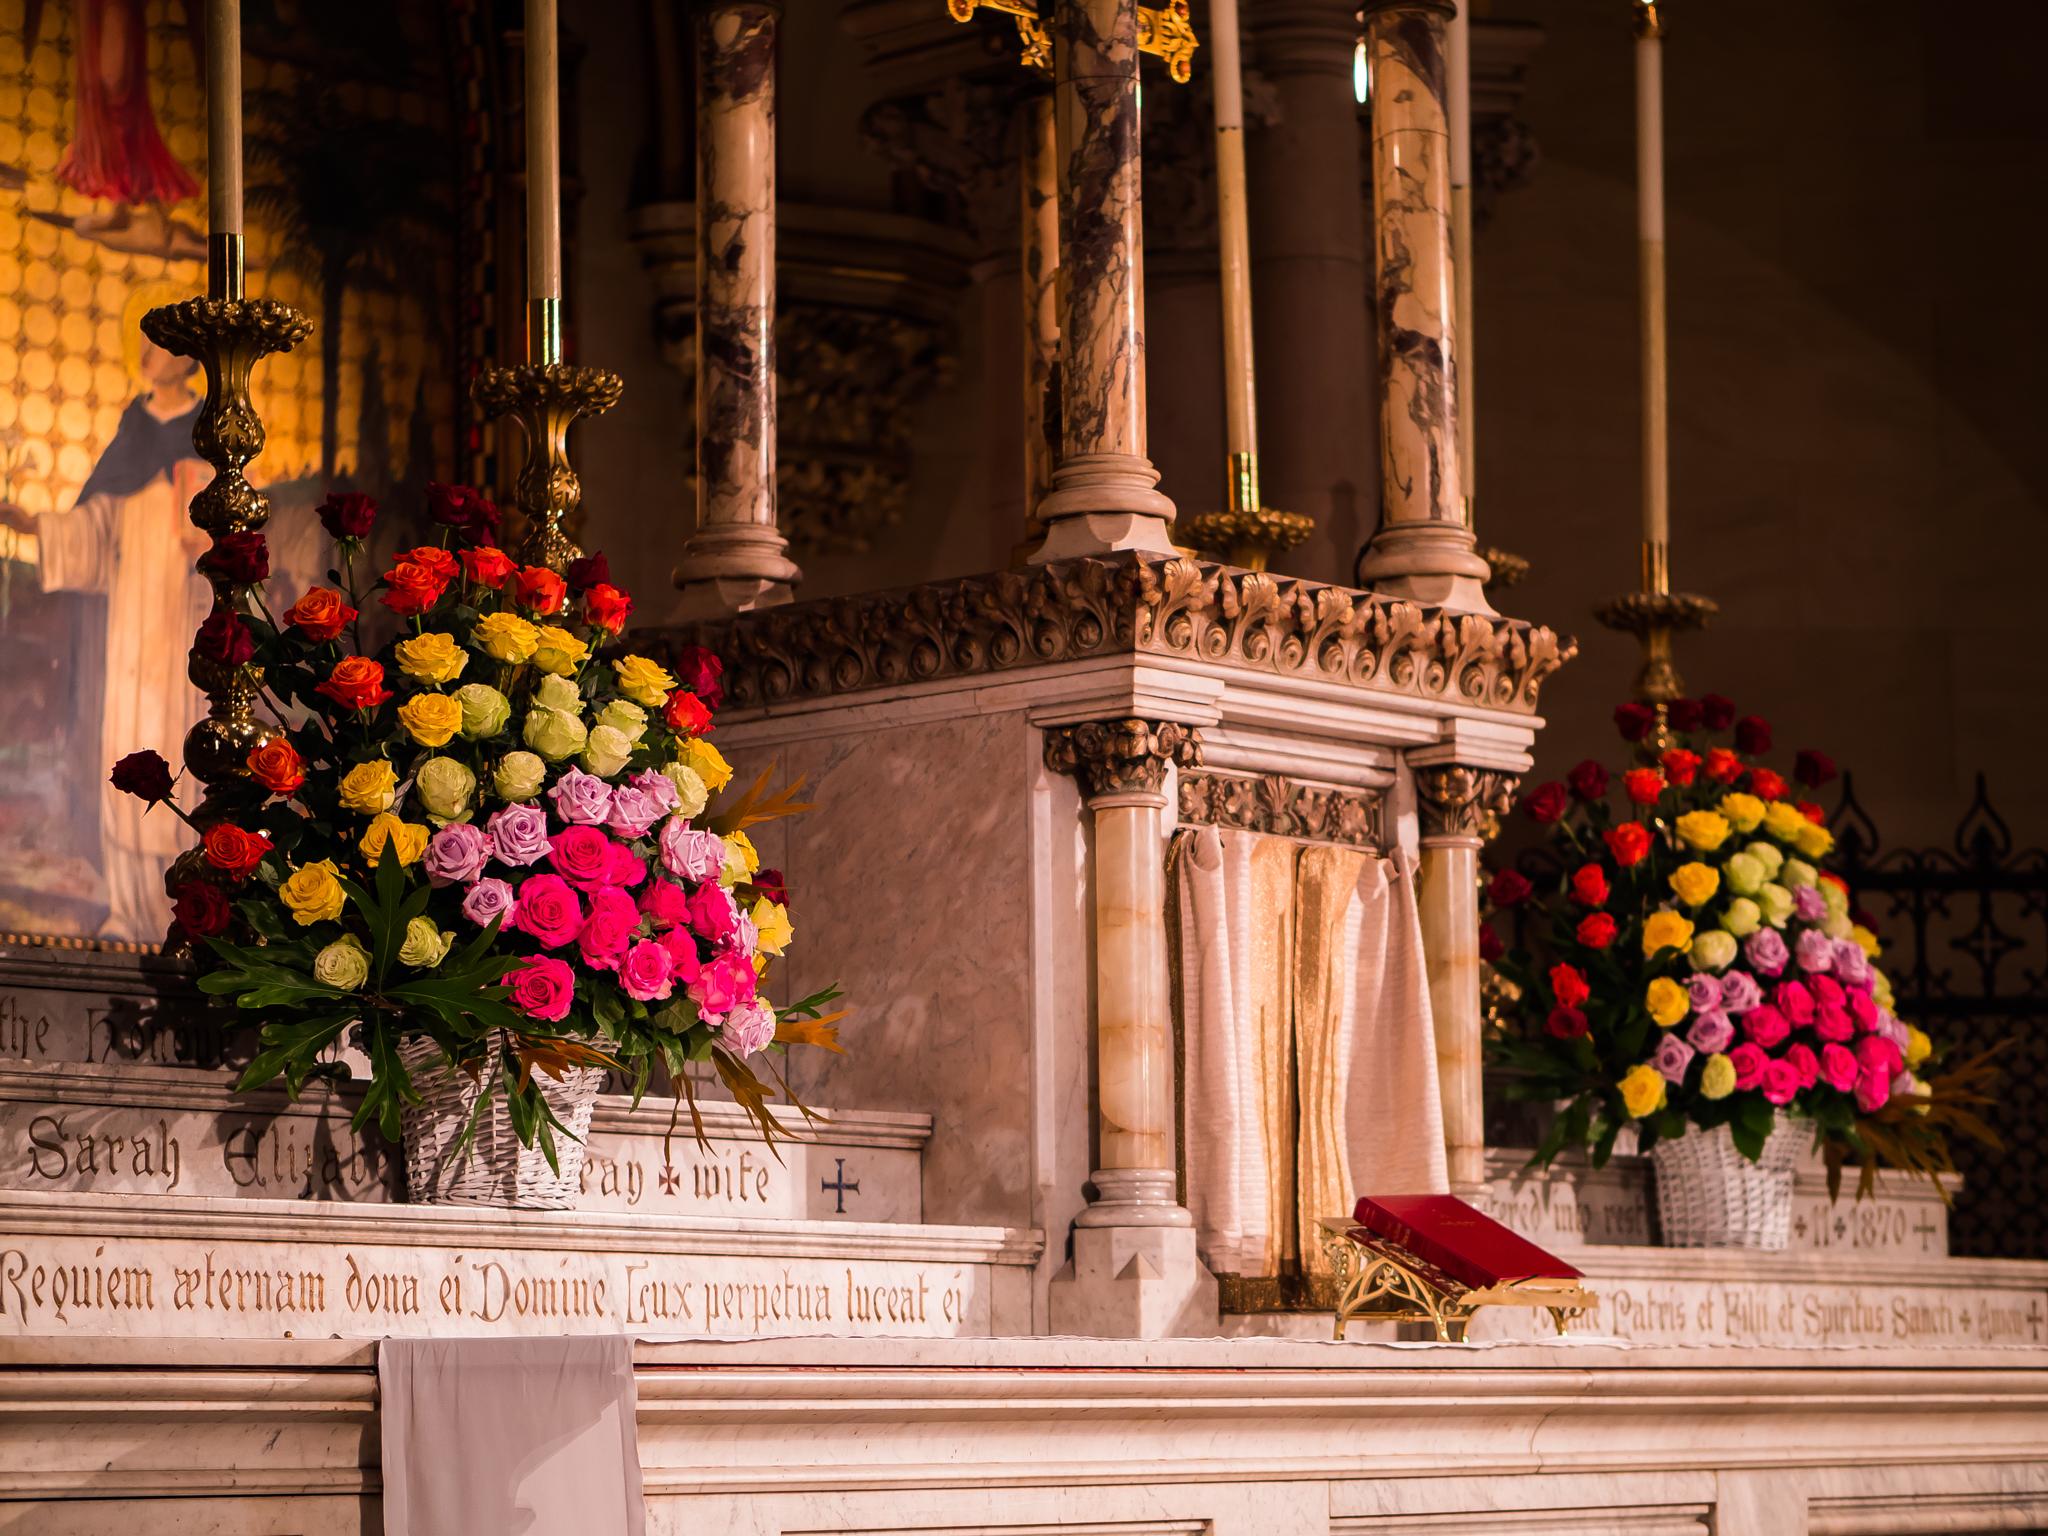 The Altar Flowers for Sunday, June 24, 2018, for the Feast of the Nativity of Saint John the Bapti   Photo by Ricardo Gomez